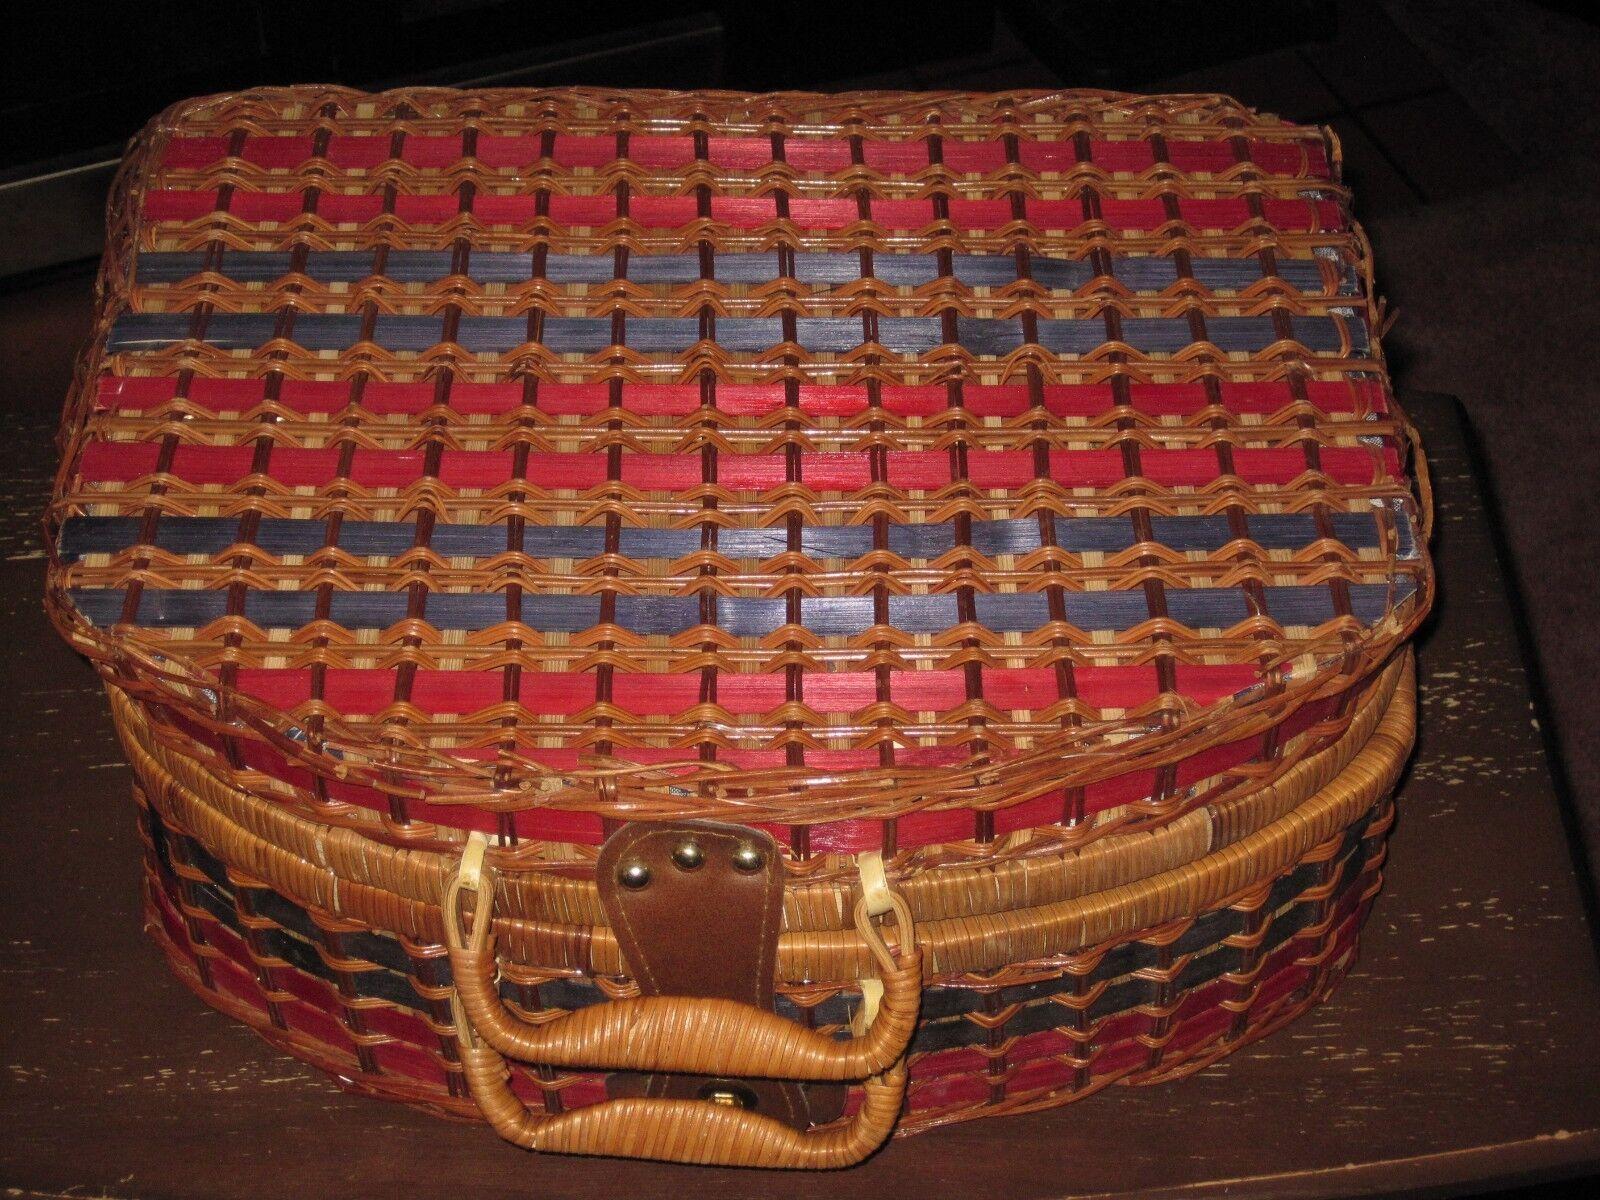 Vintage Rojo, Azul, marrón mimbre Ratán Maleta Estilo guinga Cesta de picnic